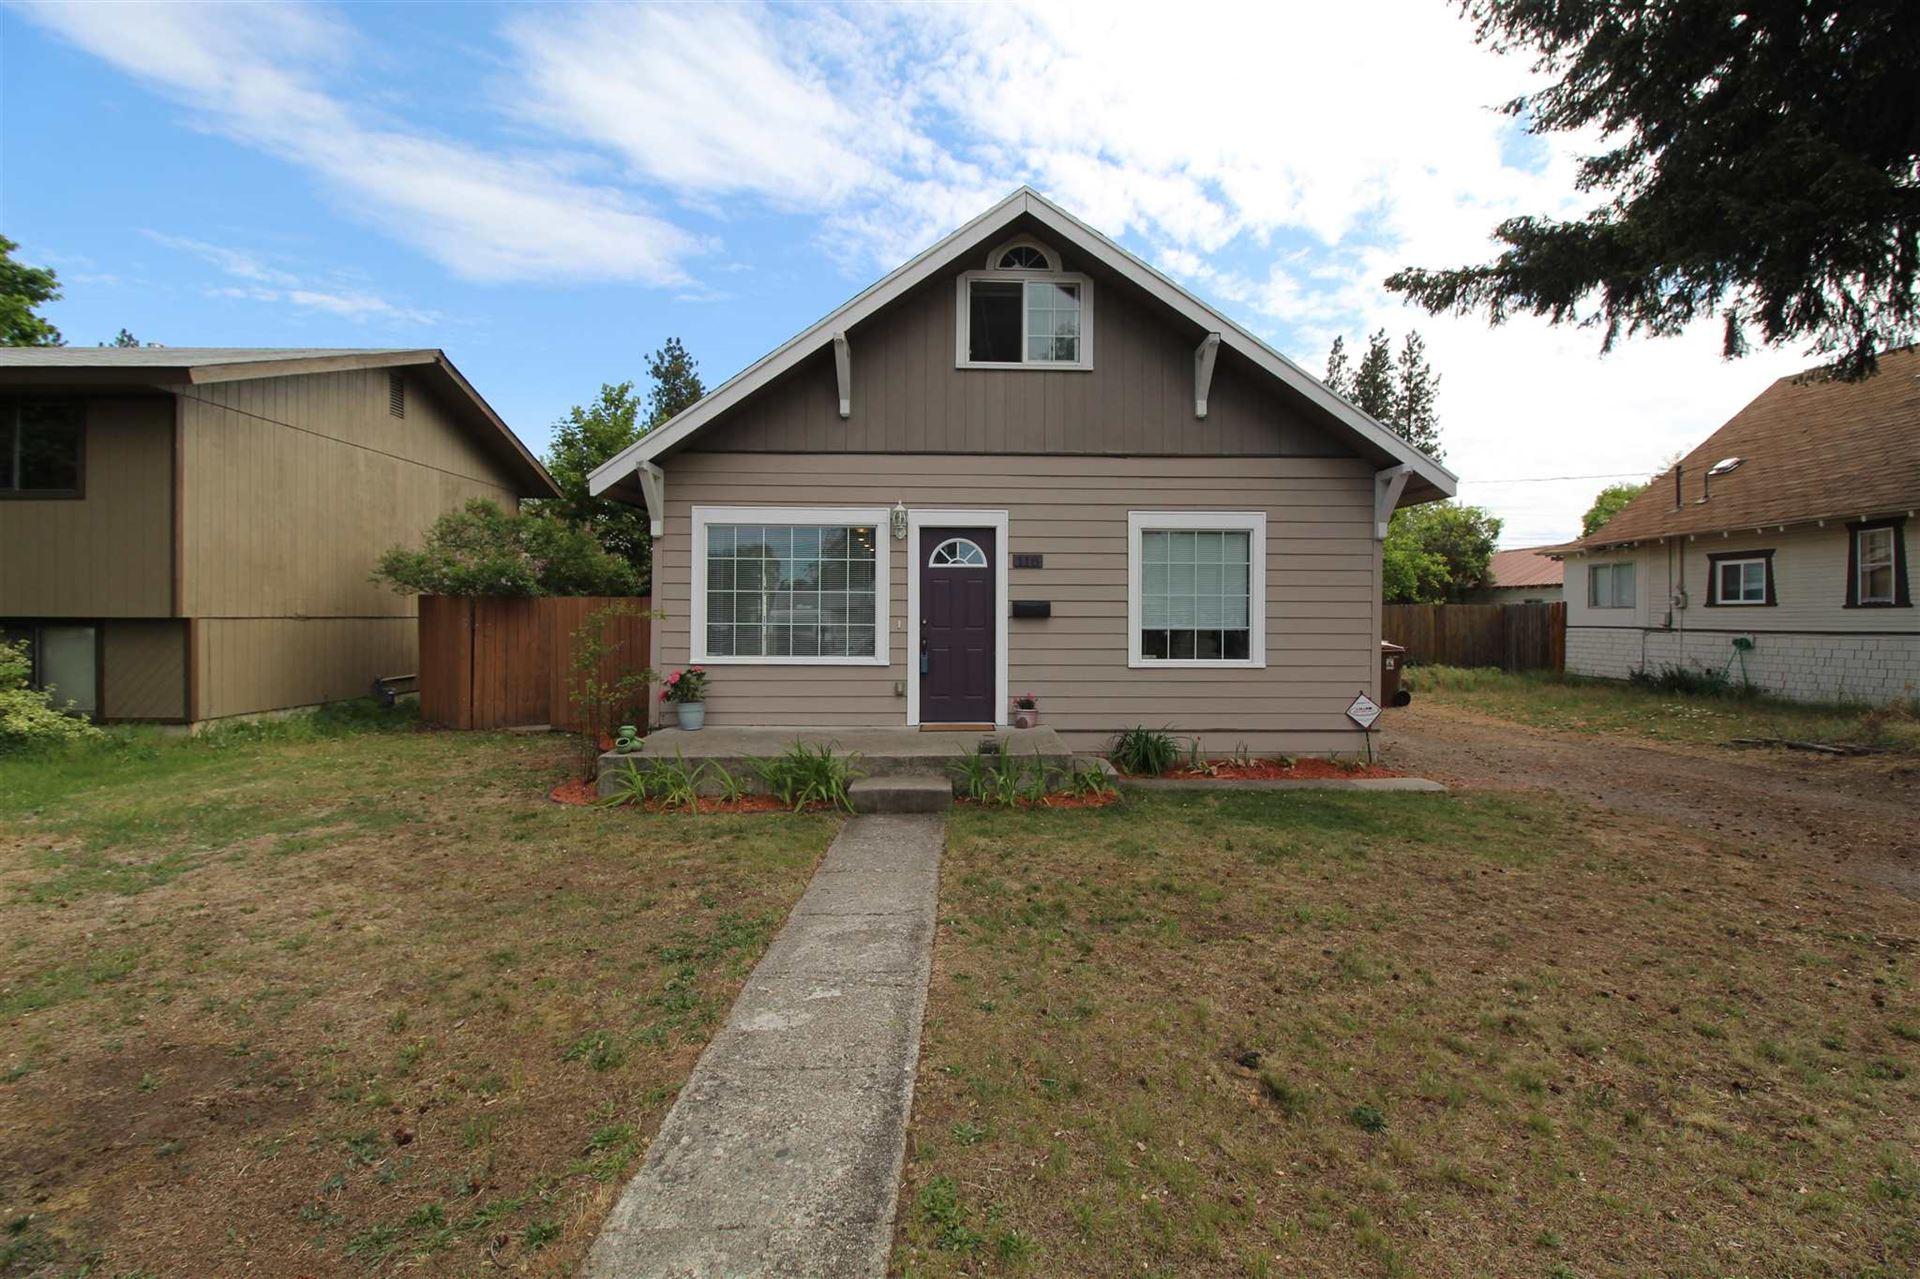 118 E Rockwell Ave, Spokane, WA 99207 - #: 202115987